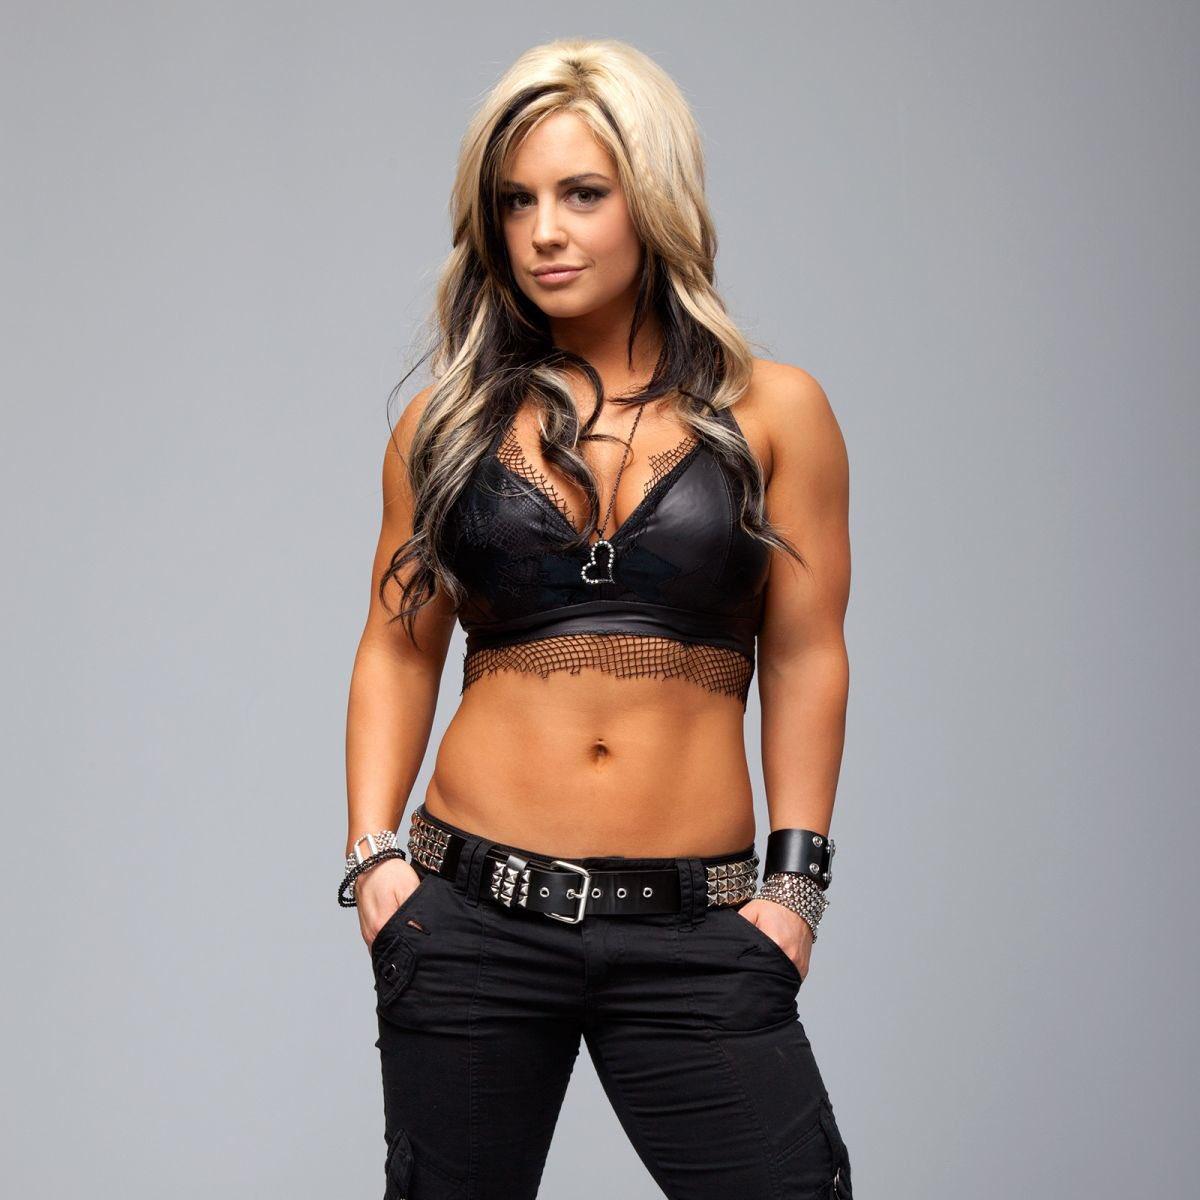 Twitter Kaitlyn (WWE) nude (18 photos), Topless, Leaked, Twitter, legs 2020